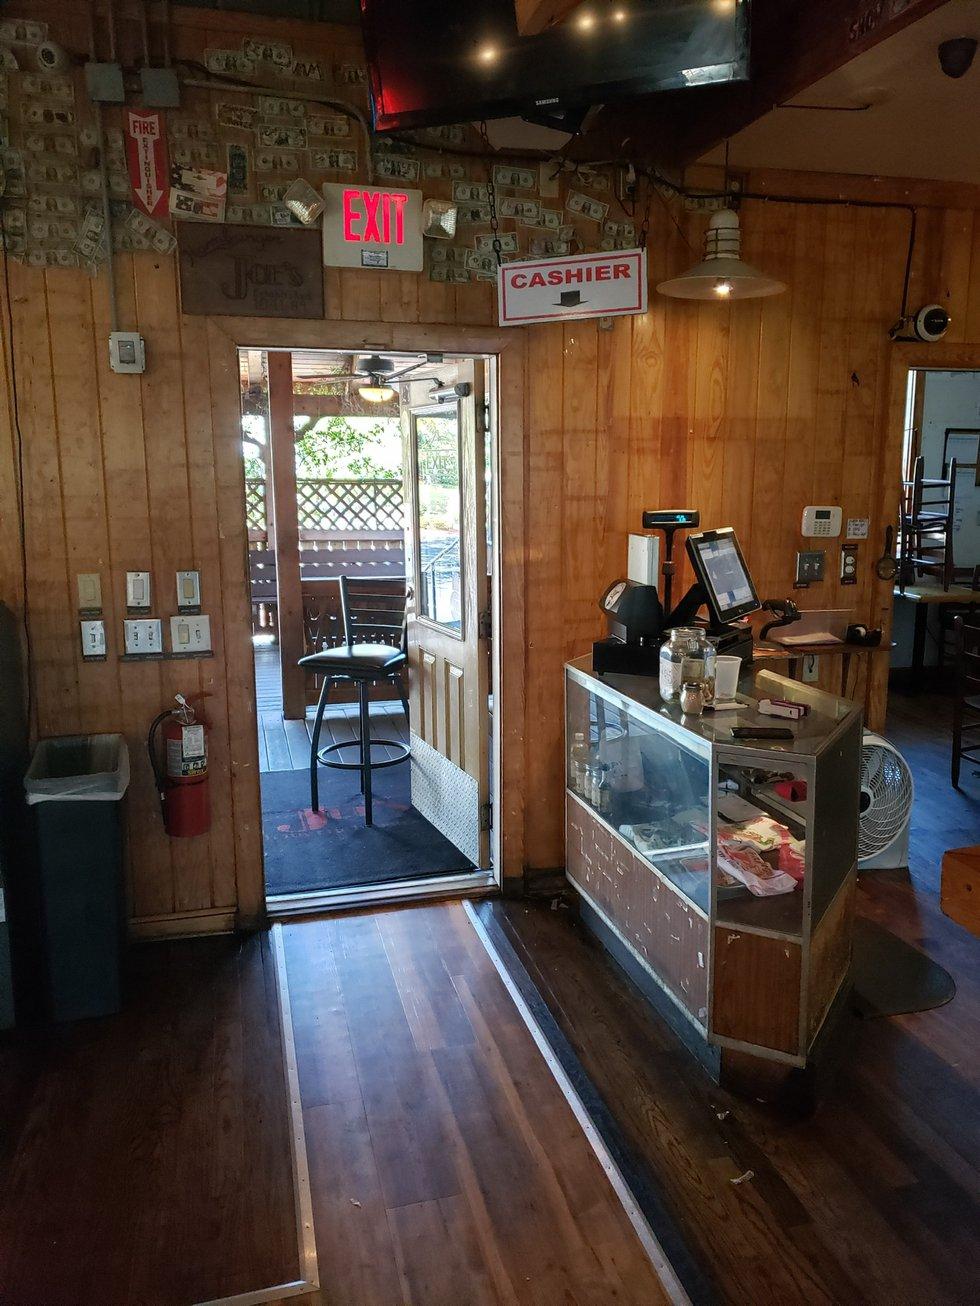 Hamburger Joe's empties its walls for employees.